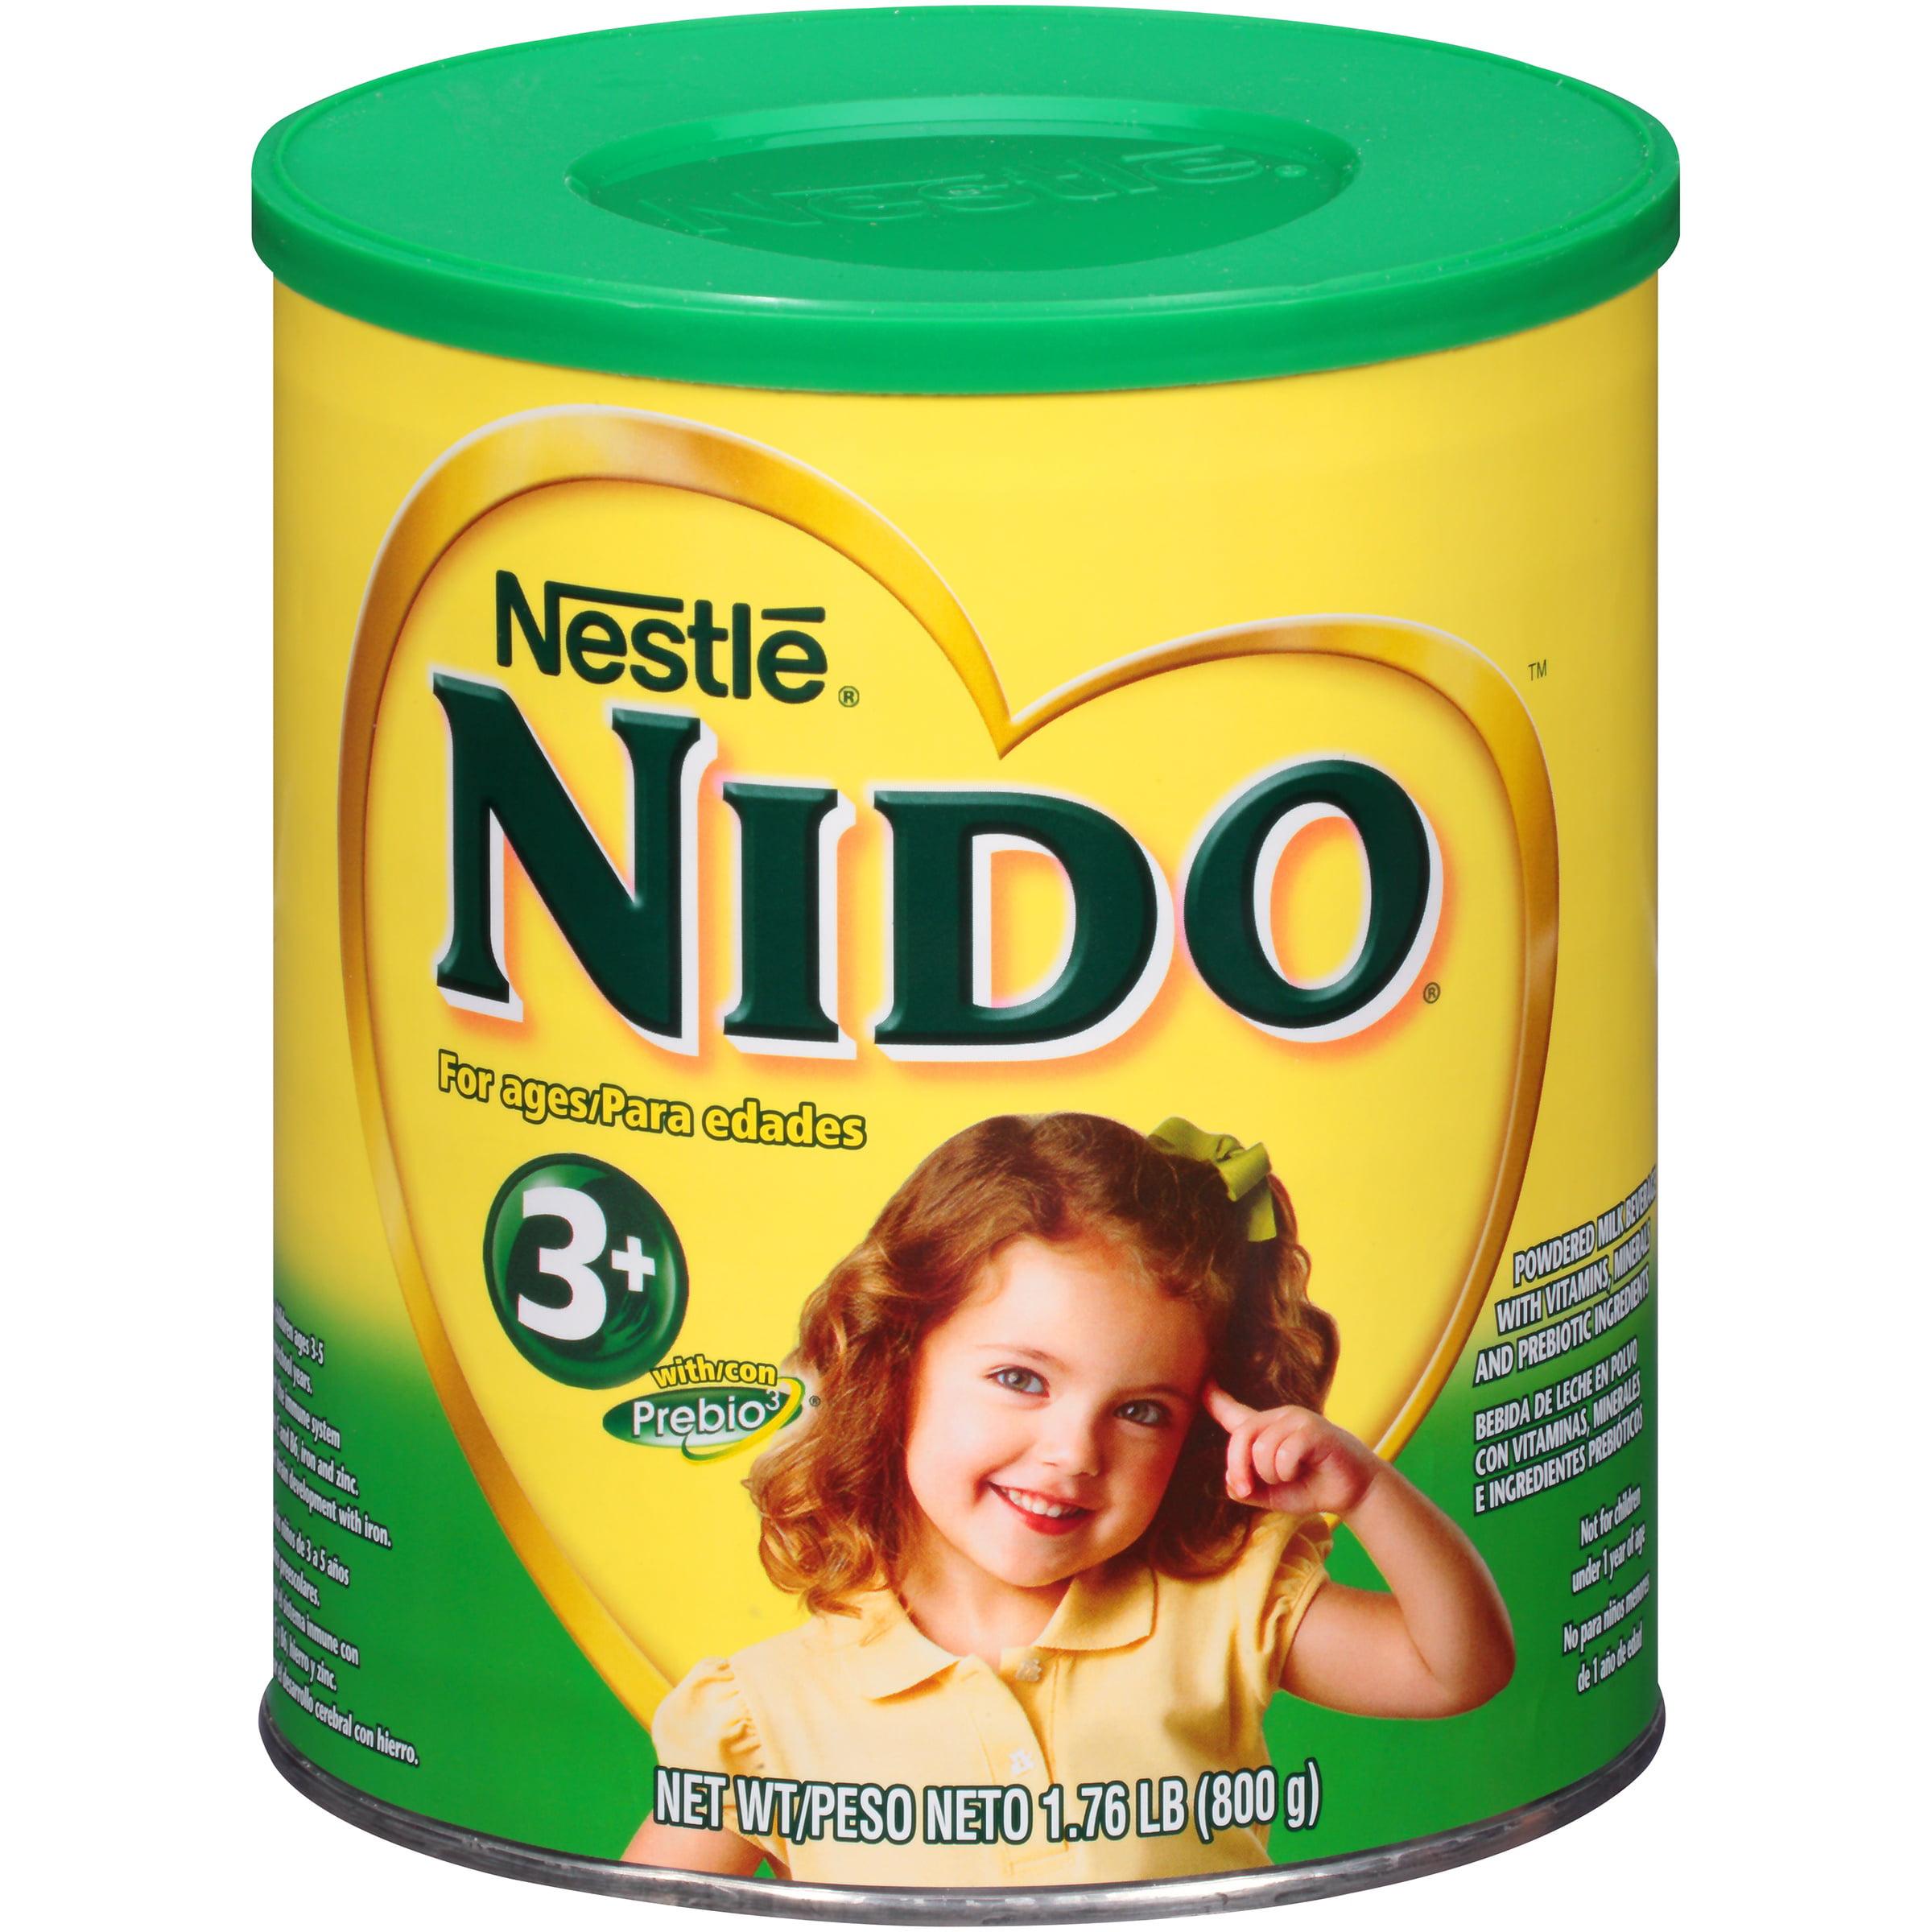 Nestle Nido Mix, Dry Milk, 27.52 Oz, 1 Count